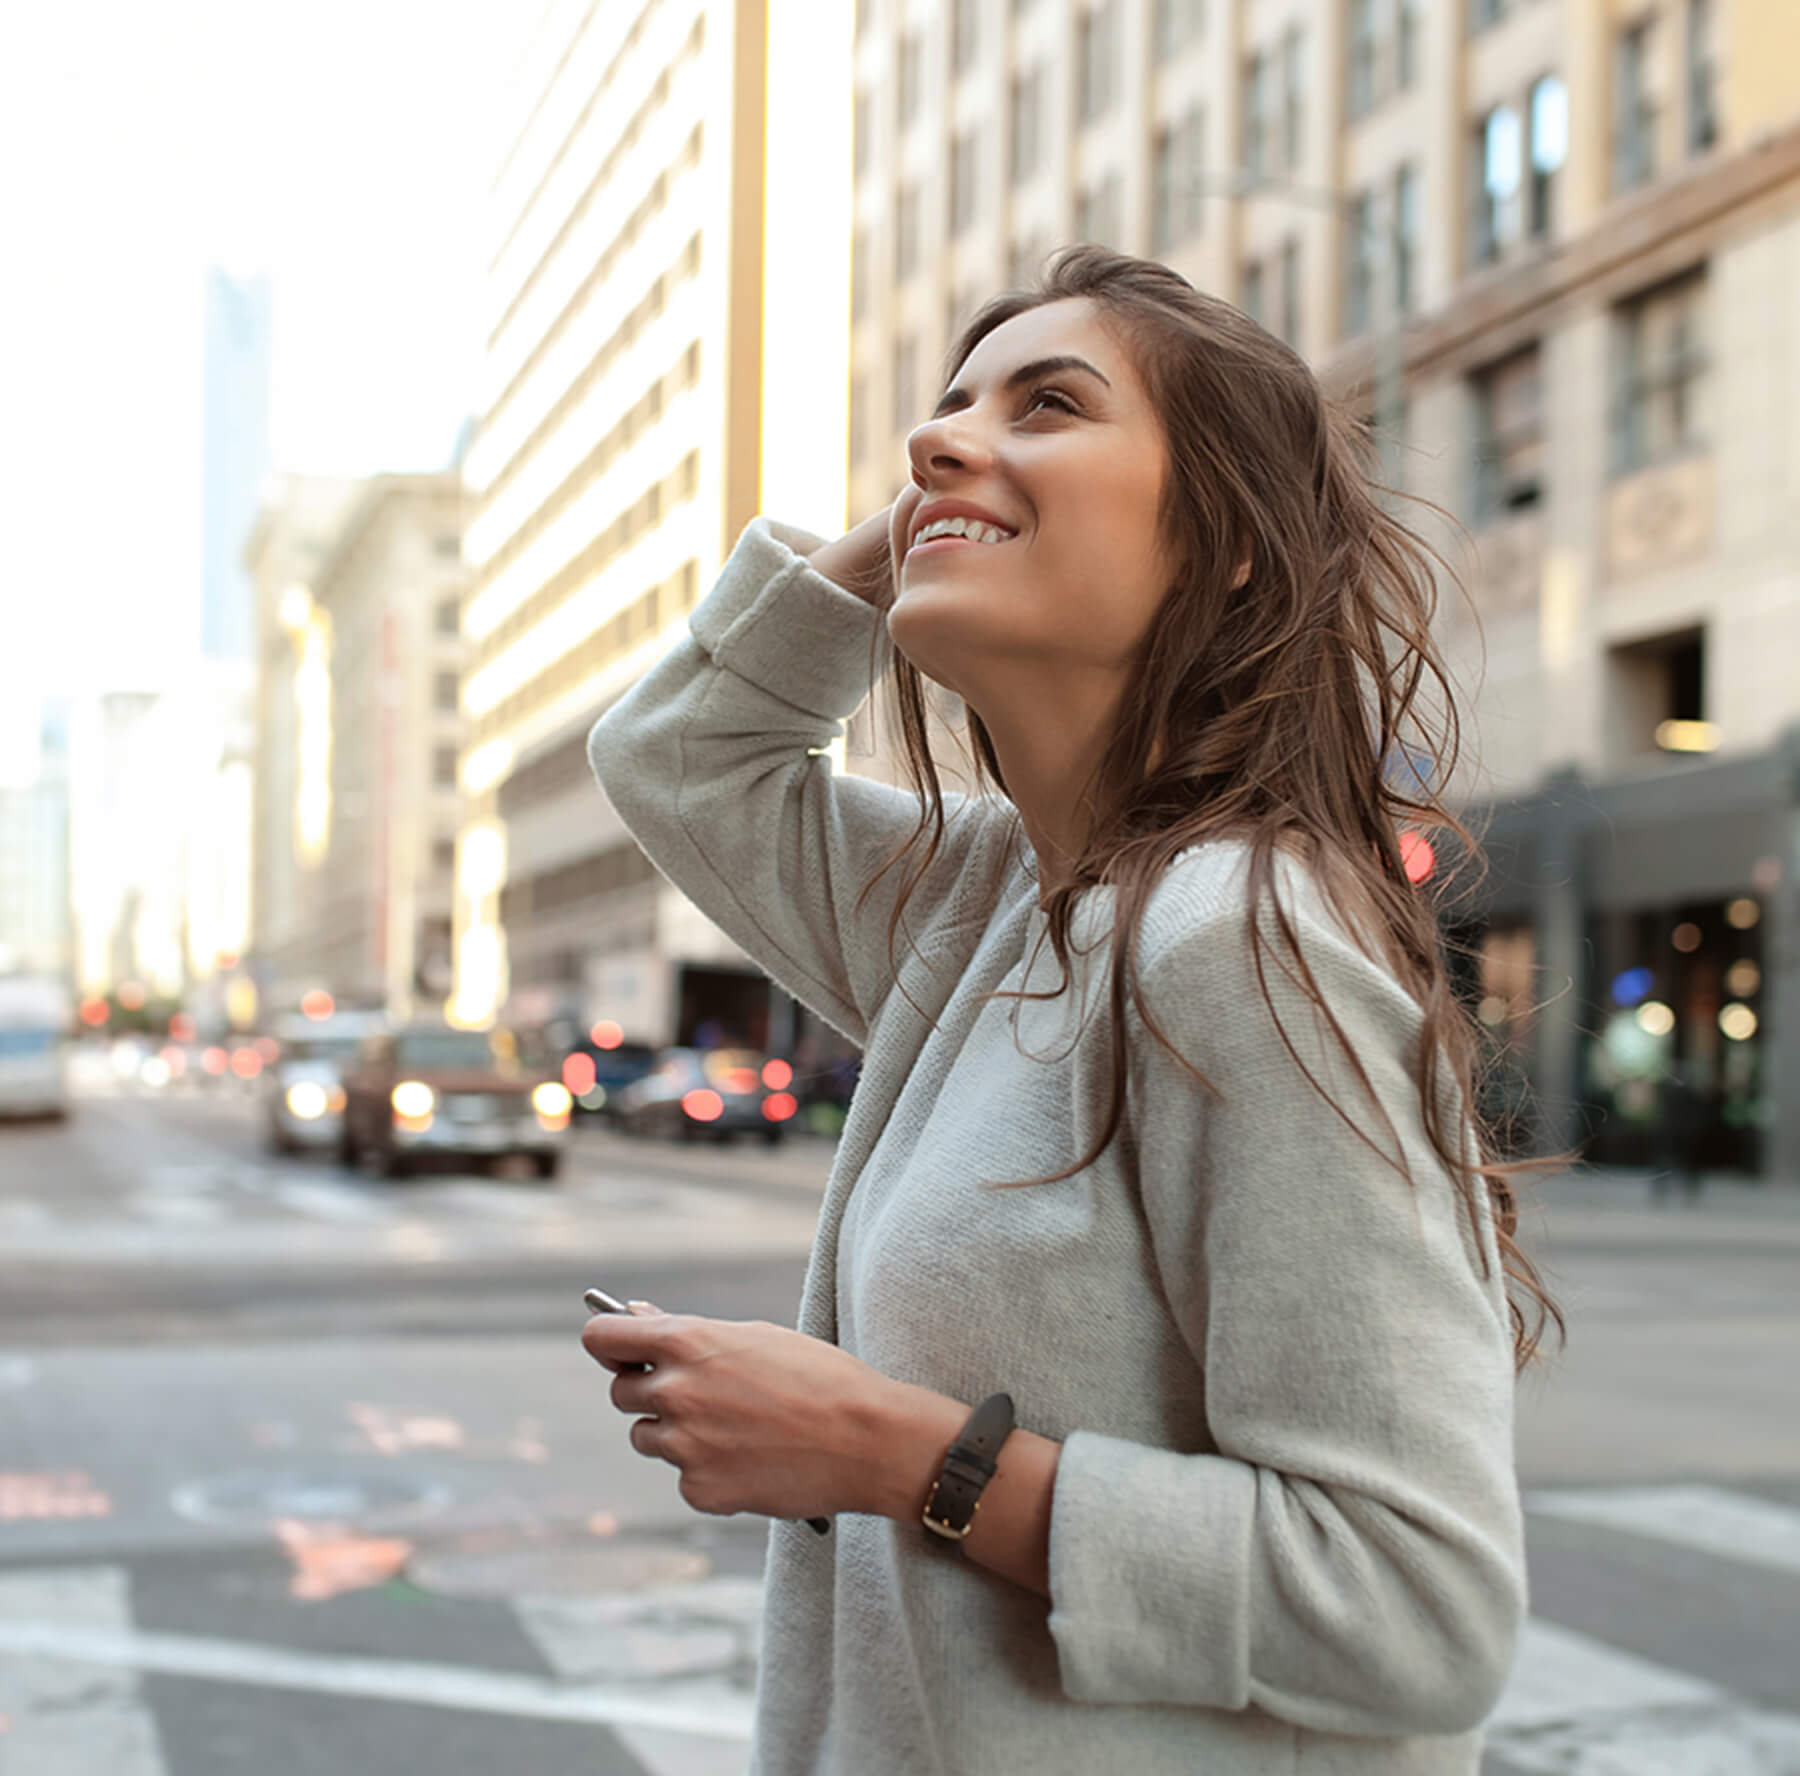 women travel experience